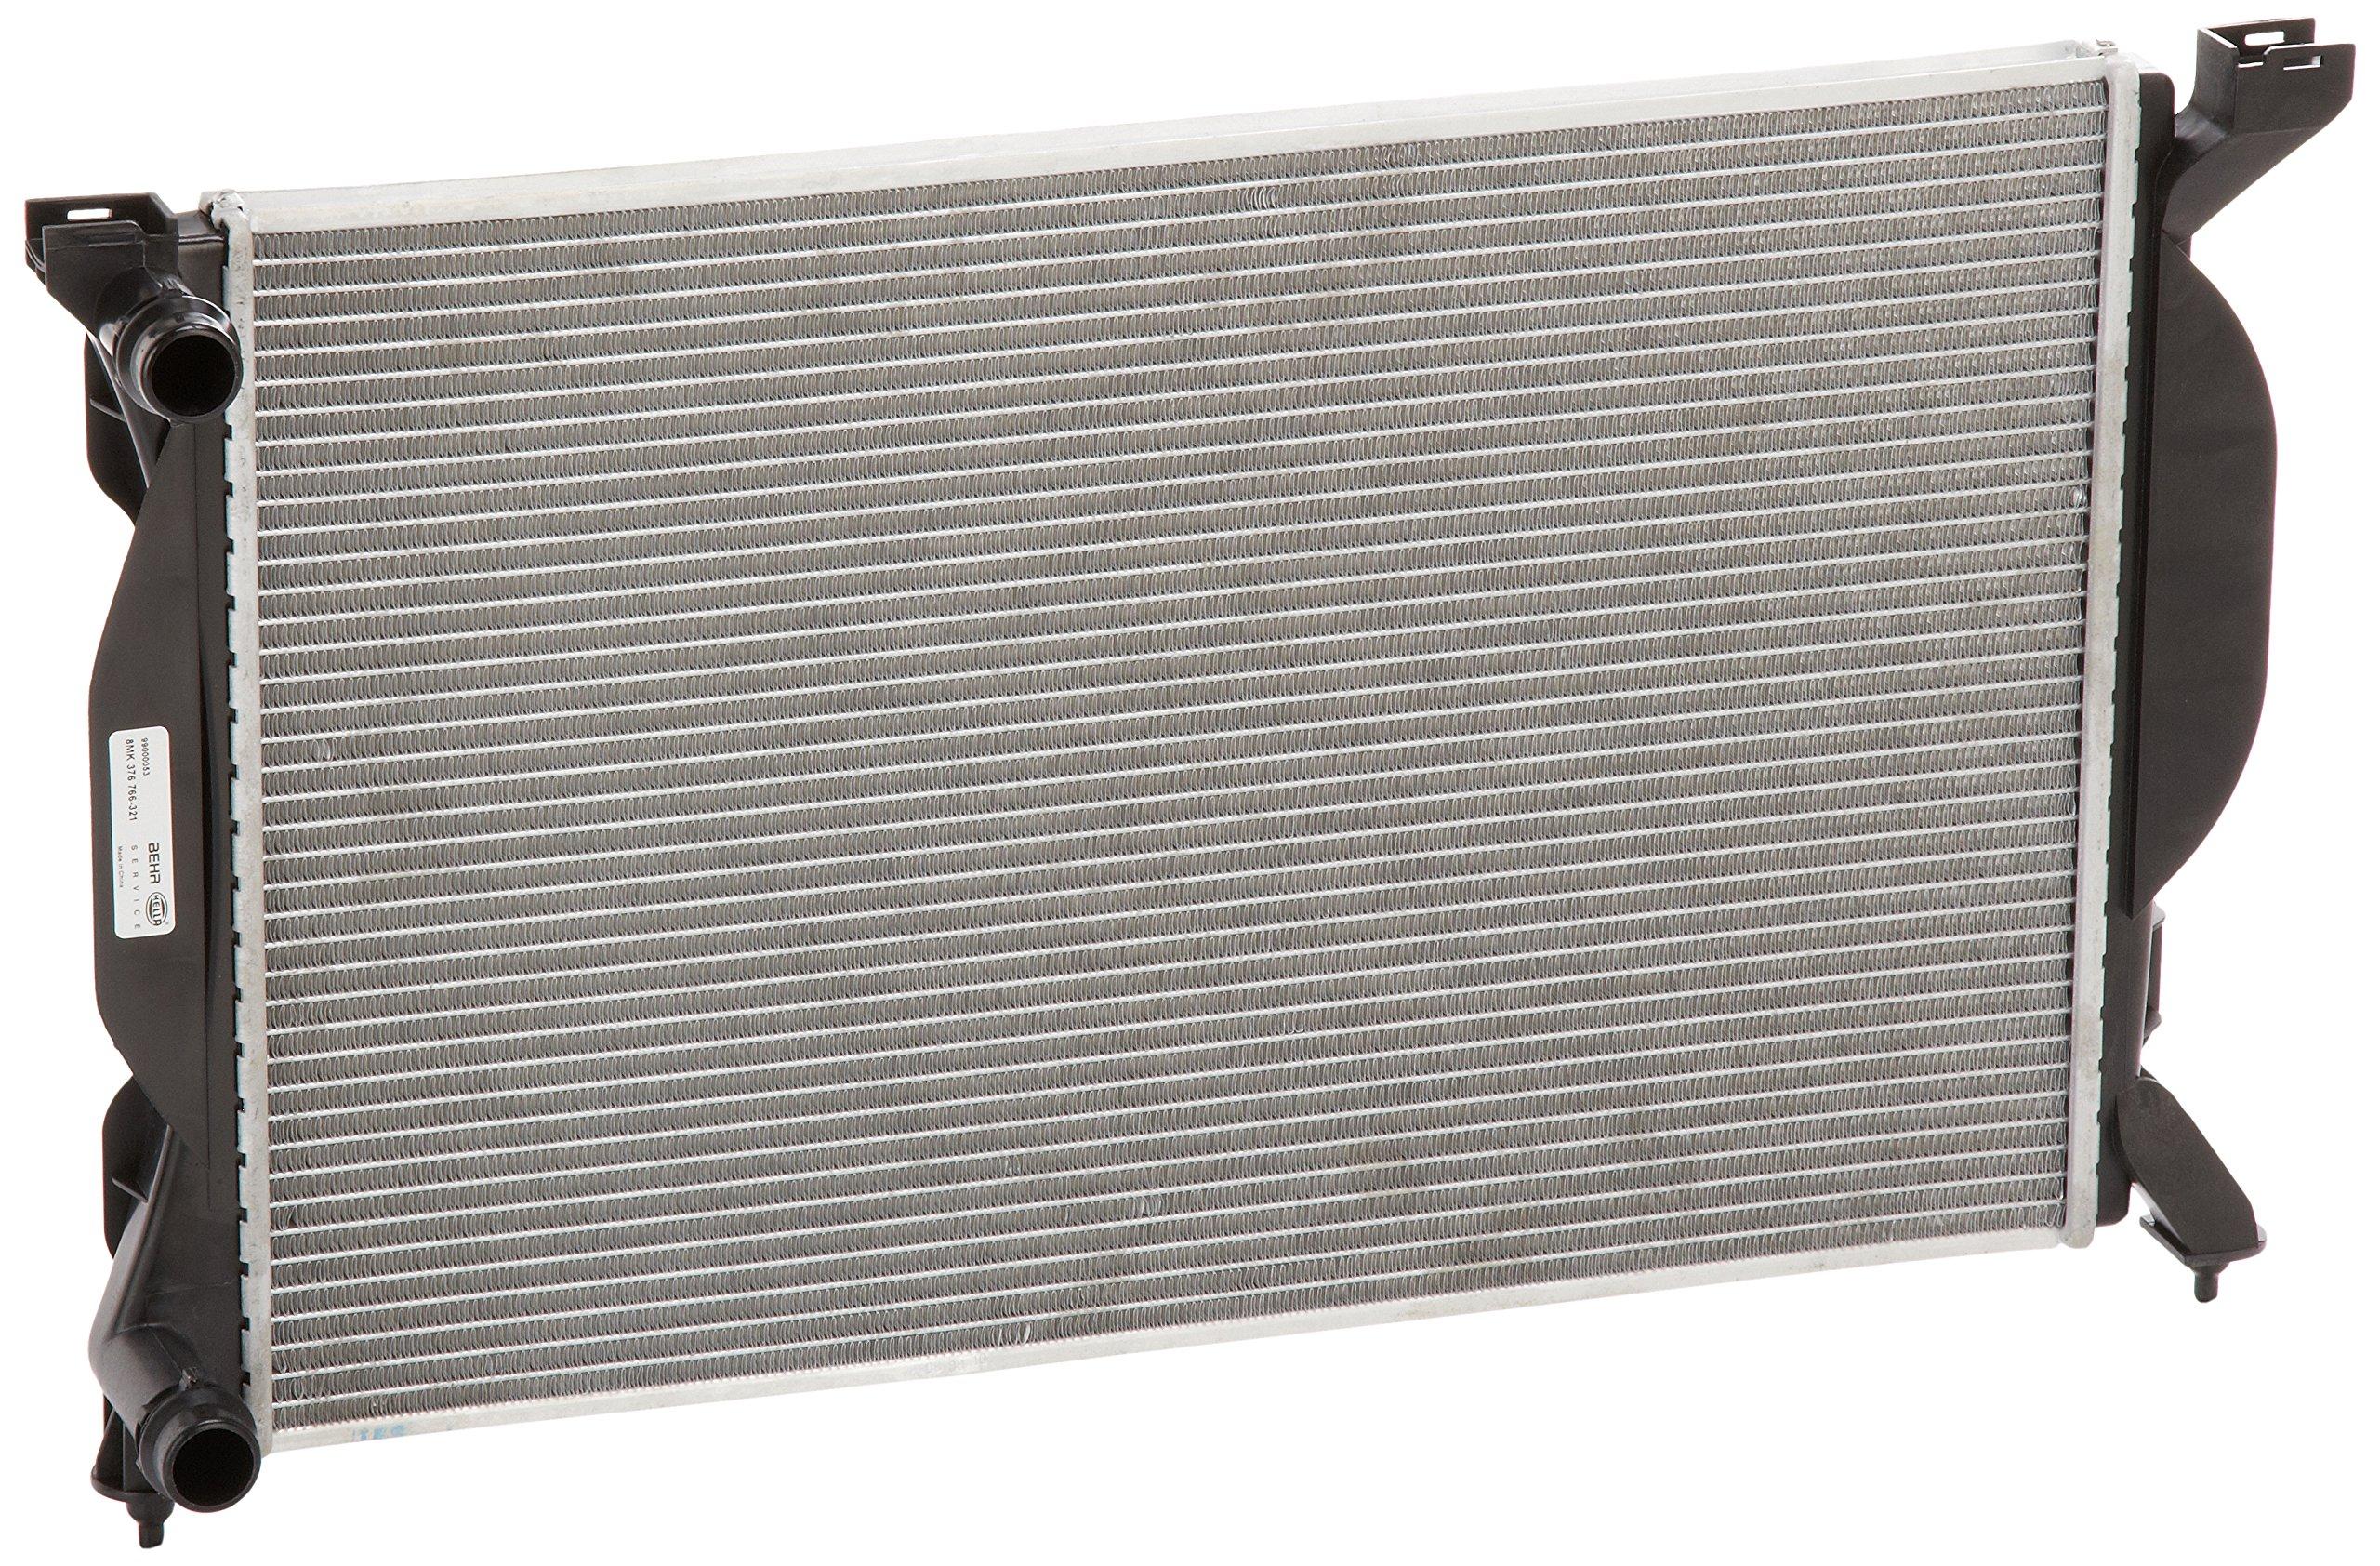 HELLA 376766321 Radiator for Audi A4/S4 GEN 2 02-08